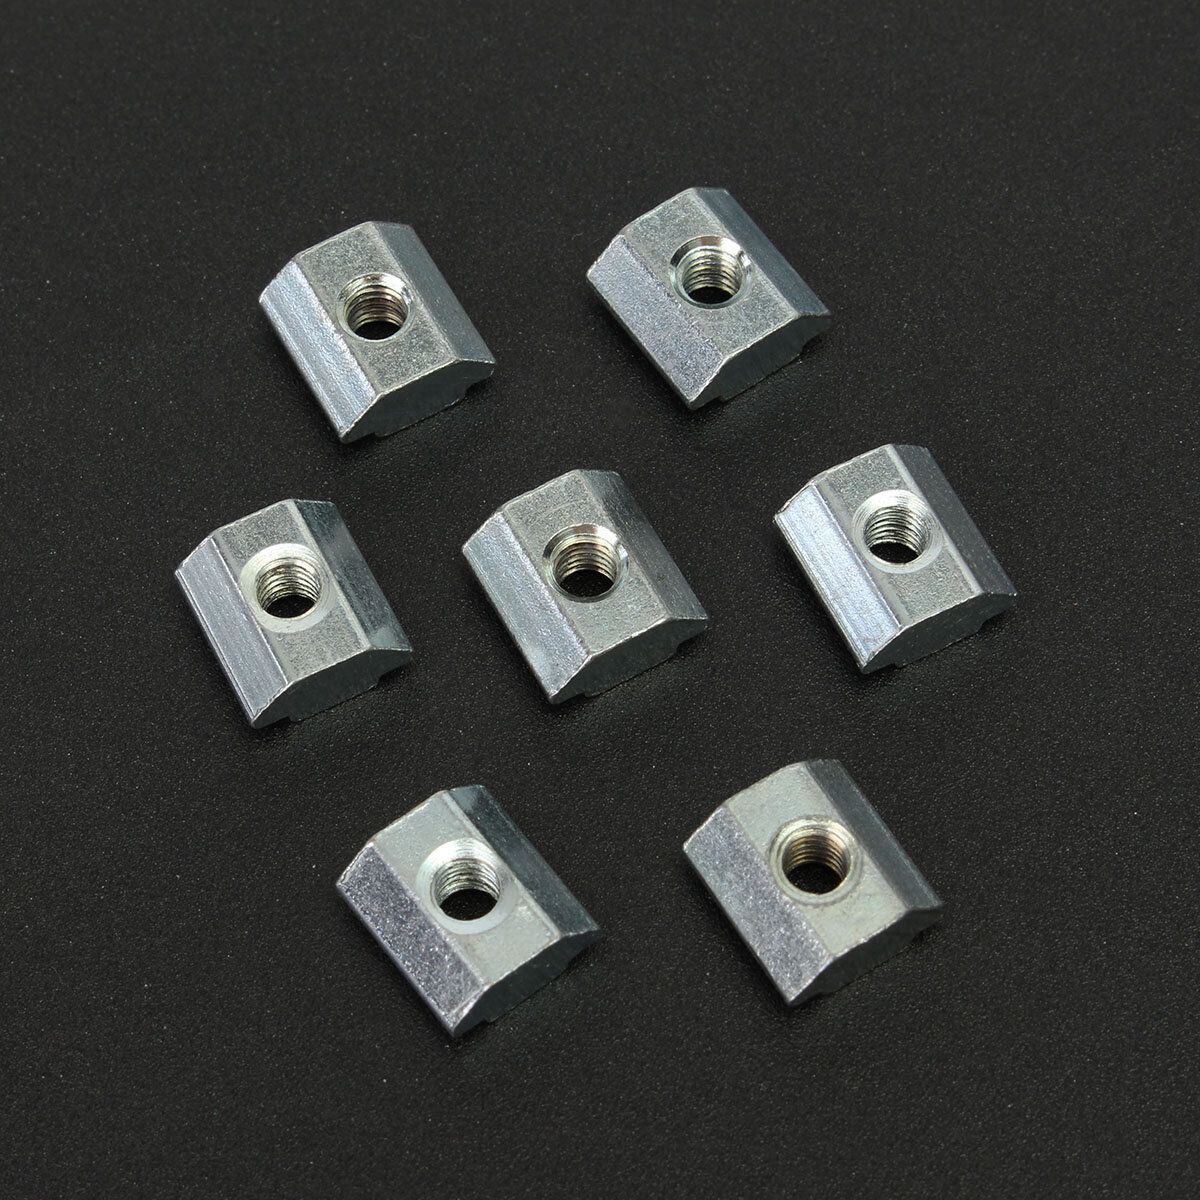 WVD US$6.85 50pcs M4 T Sliding Nut Block for 2020 Aluminum Profile Zinc Coated Plate Aluminum Accessories